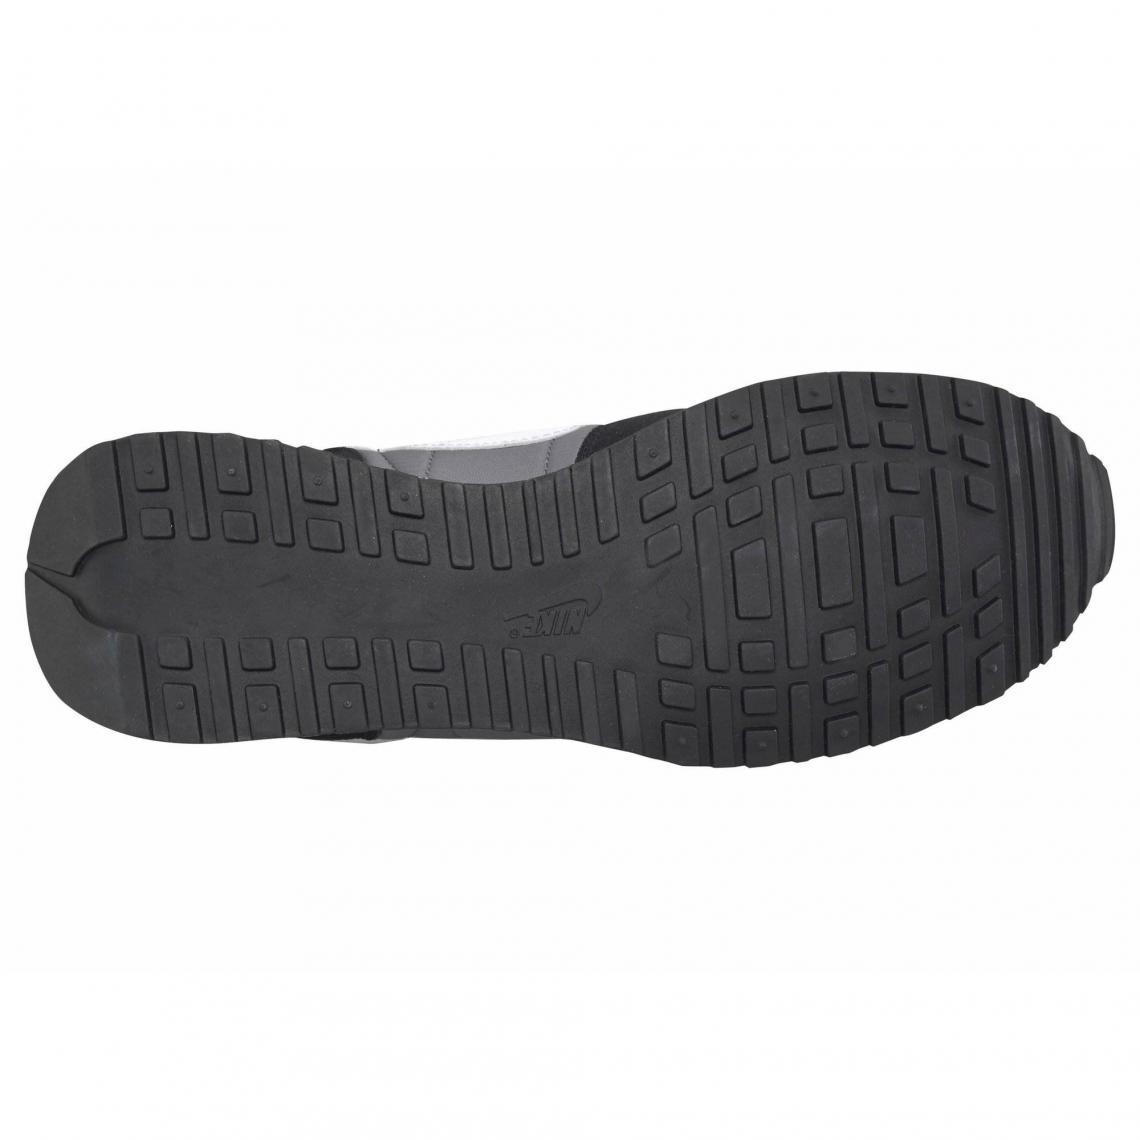 4e5ebf6b087 Nike Air Vortex chaussures de running homme - Noir - Gris Nike